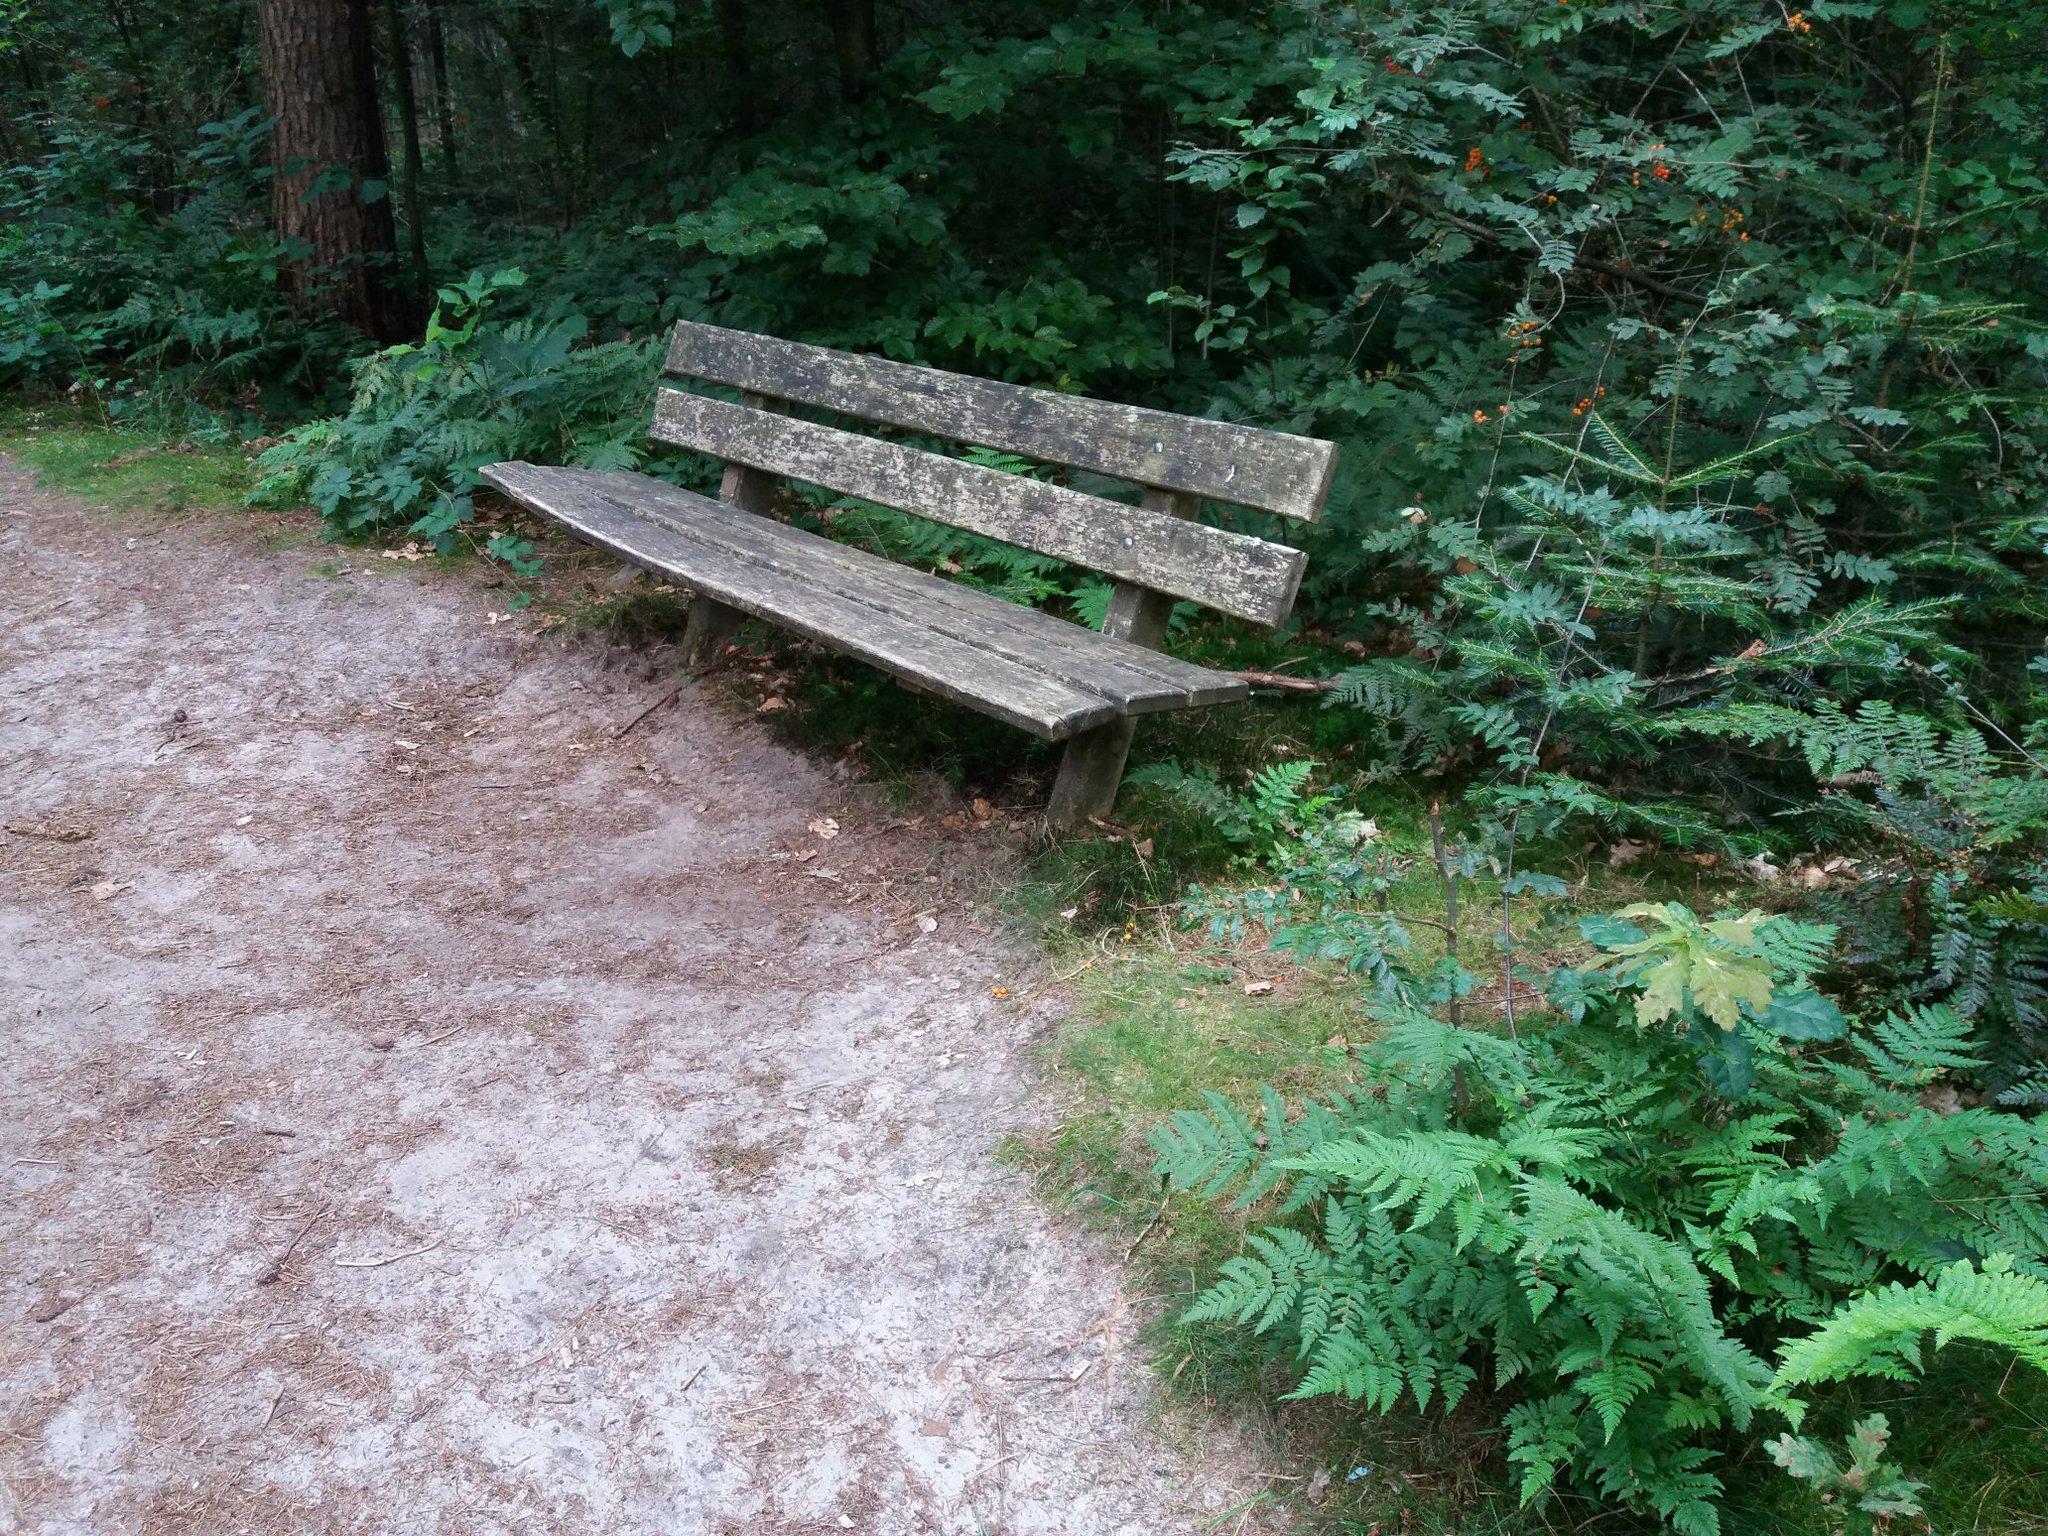 rt-wandelenmetwar-wandelbankjes-poolshoogte-odoorn-https-t-co-tpilginxab